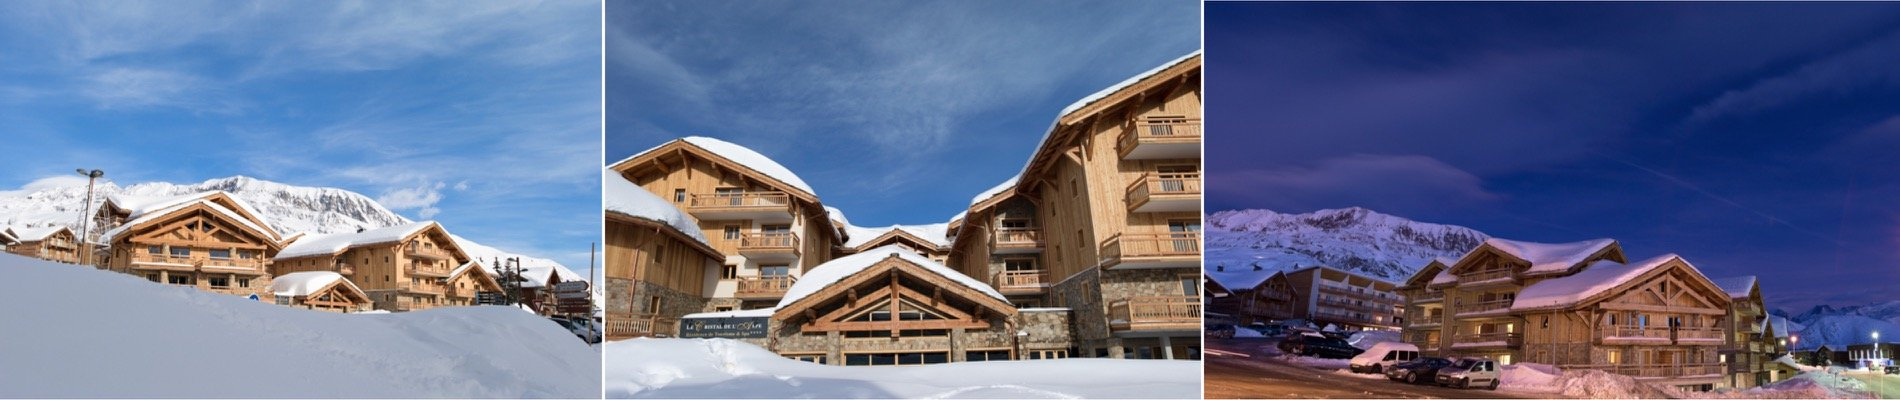 Frankrijk, Alpe d'Huez, , Alpe d'Huez